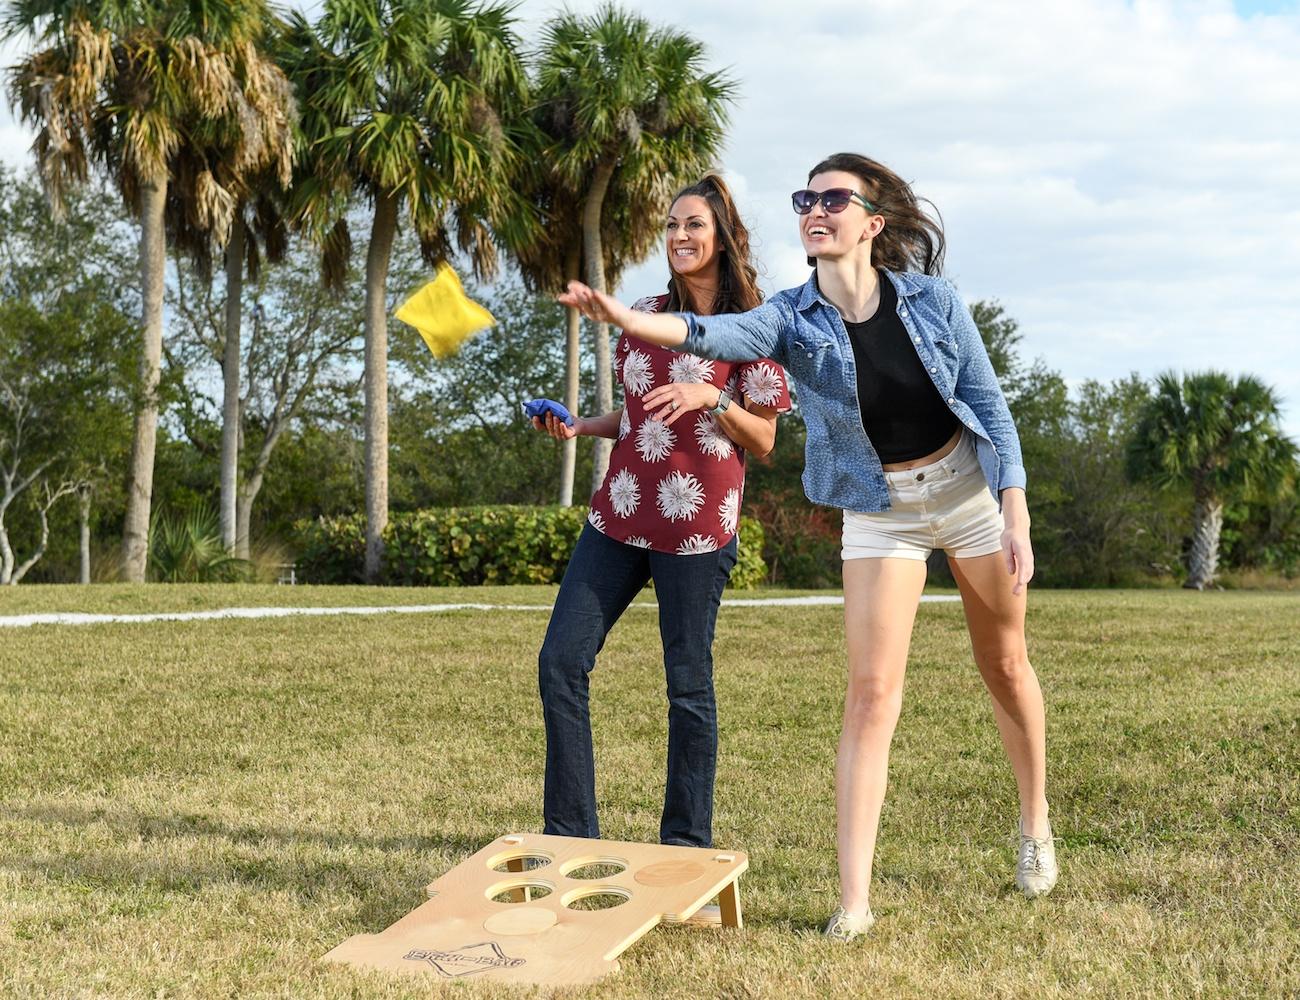 Bru-Bag Bean Bag Toss Lawn Game